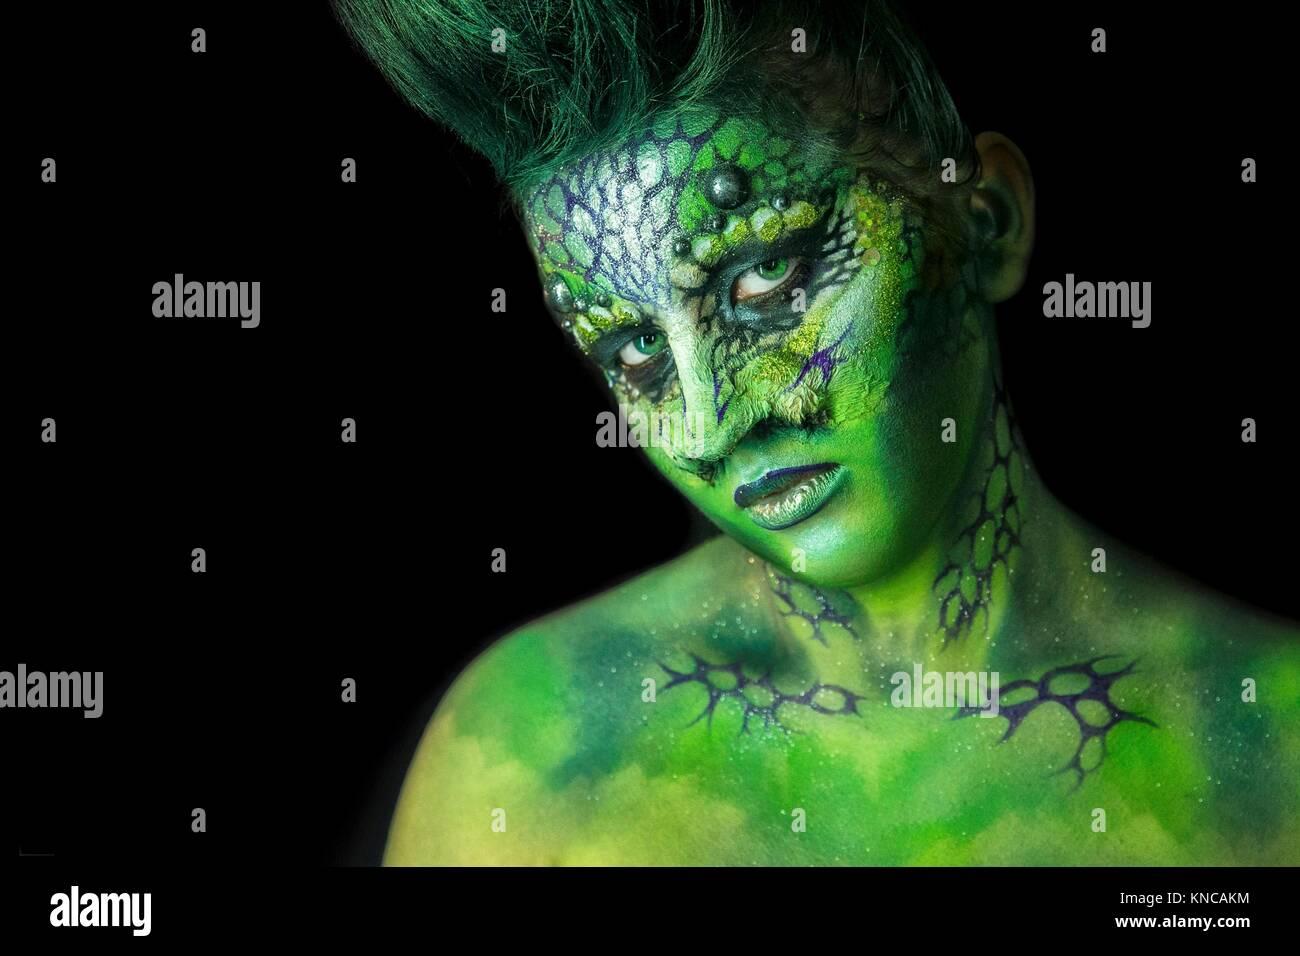 Fantastic Reptilian Girl. Creative Make up like Alien or Superhero Movie. Stock Photo